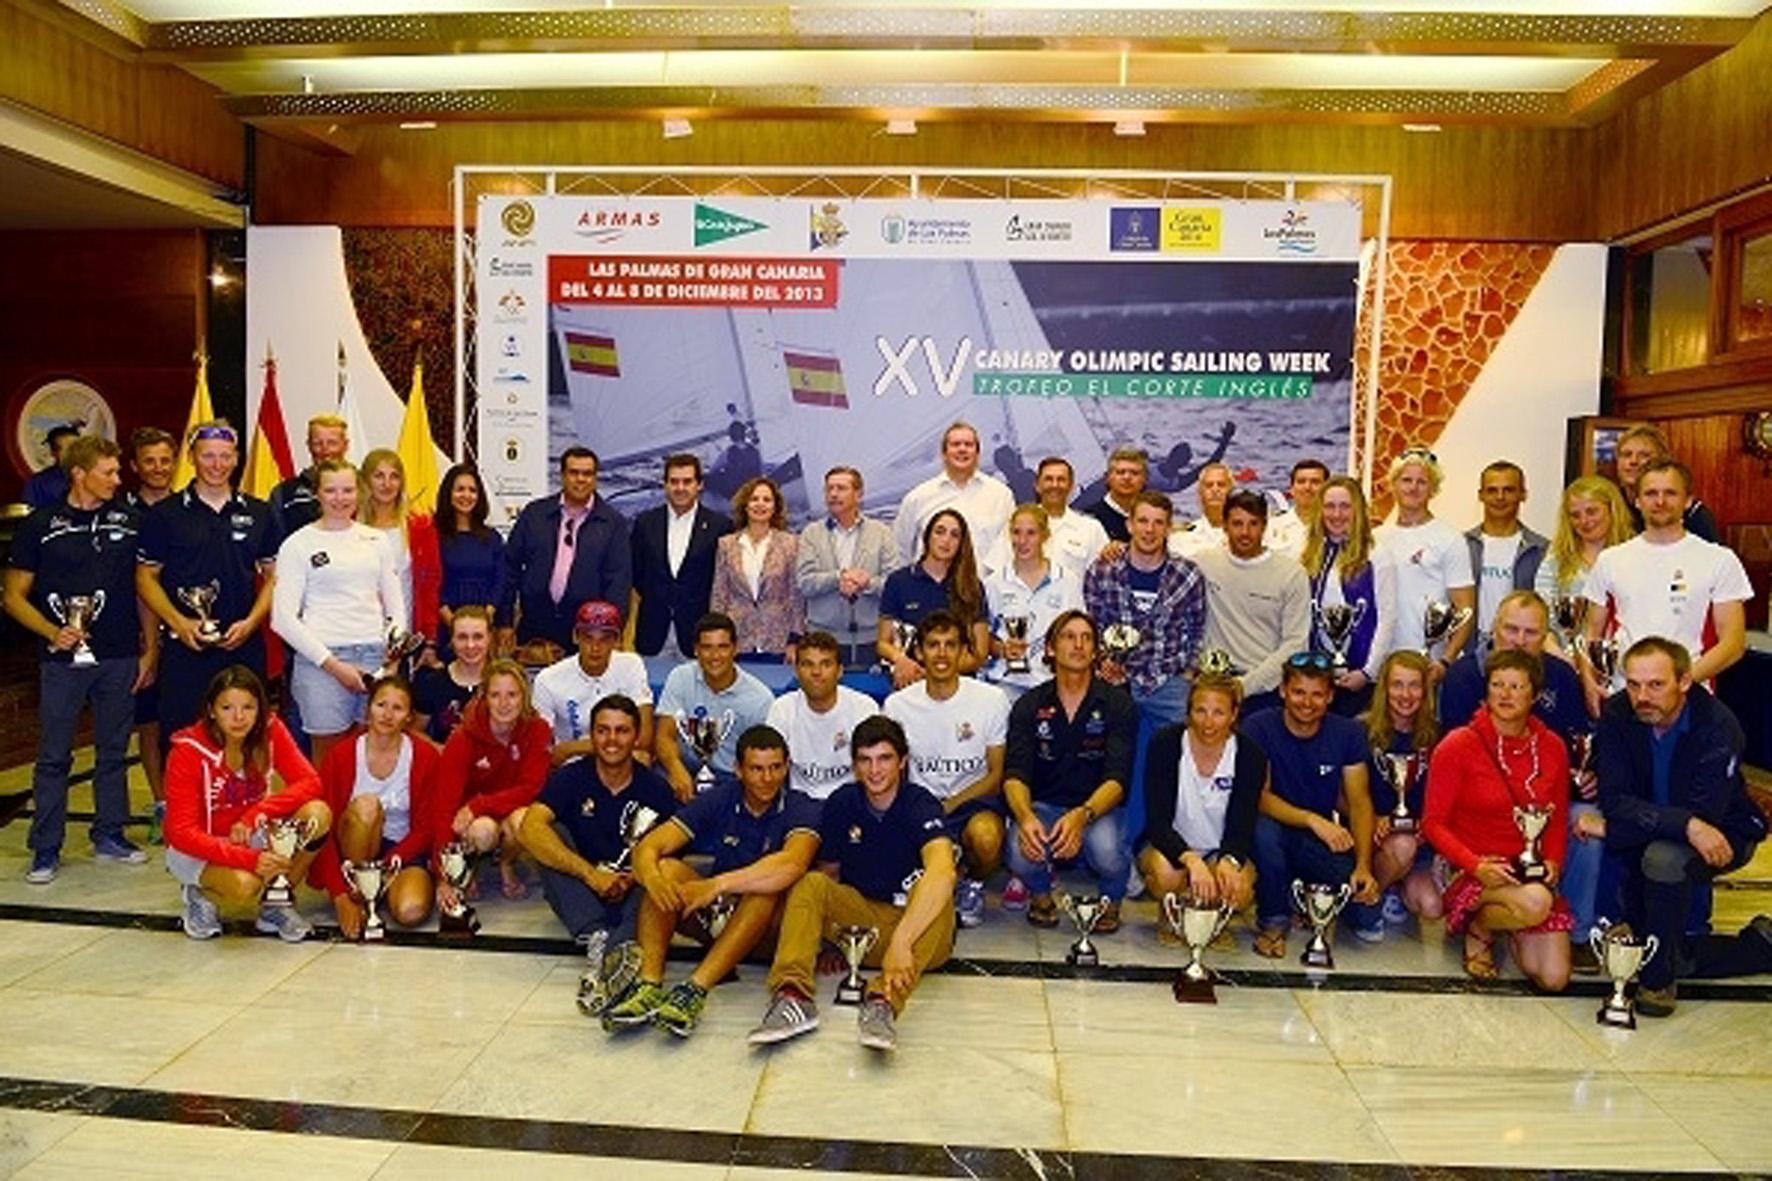 Participantes de la XV Semana Olímpica Canaria de Vela. Fuente: RCN Gran Canaria